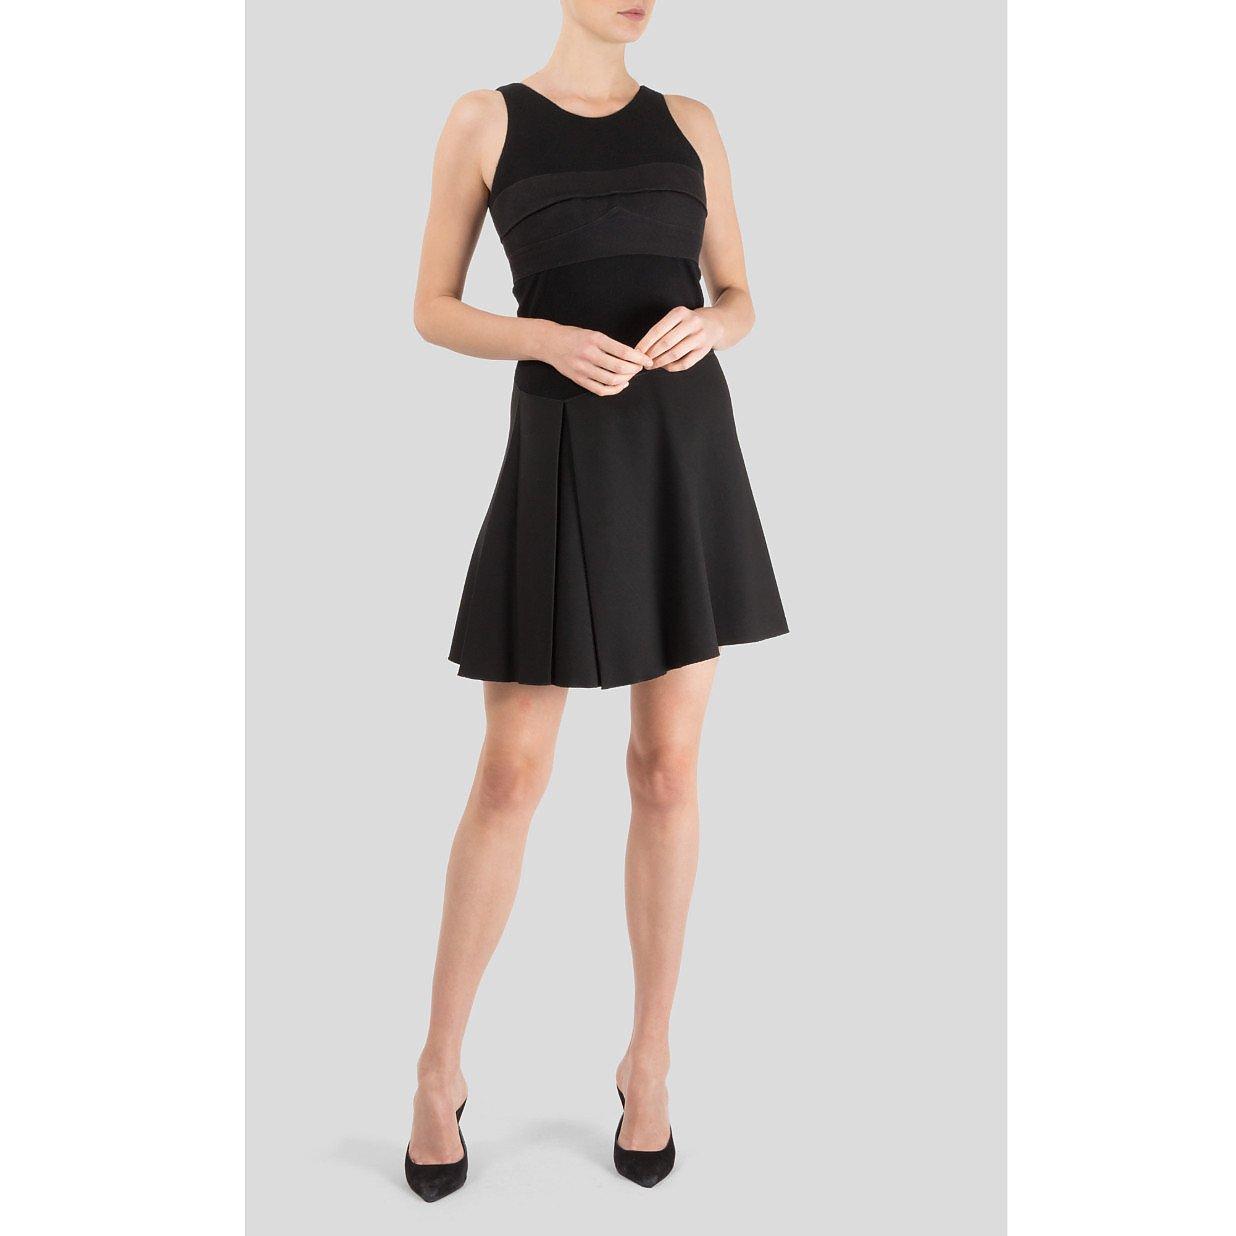 Victoria Beckham Sleeveless Mini Dress